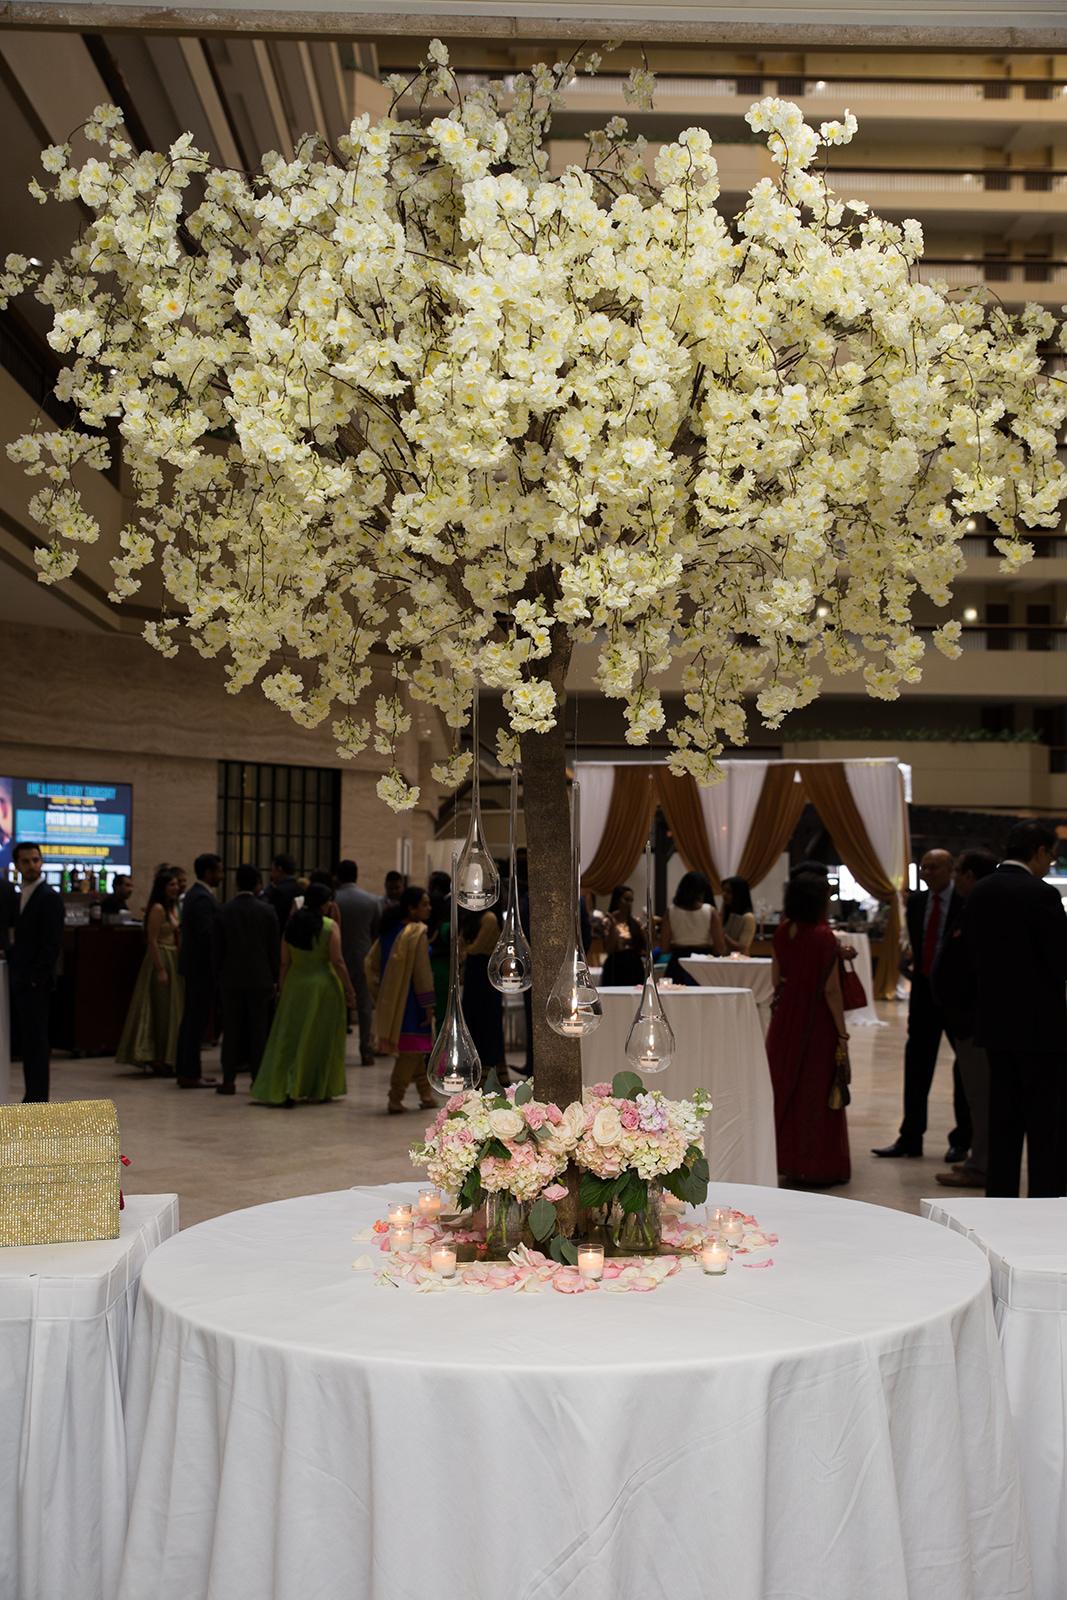 Le Cape Weddings - Sumeet and Chavi - Reception Details  -25.jpg